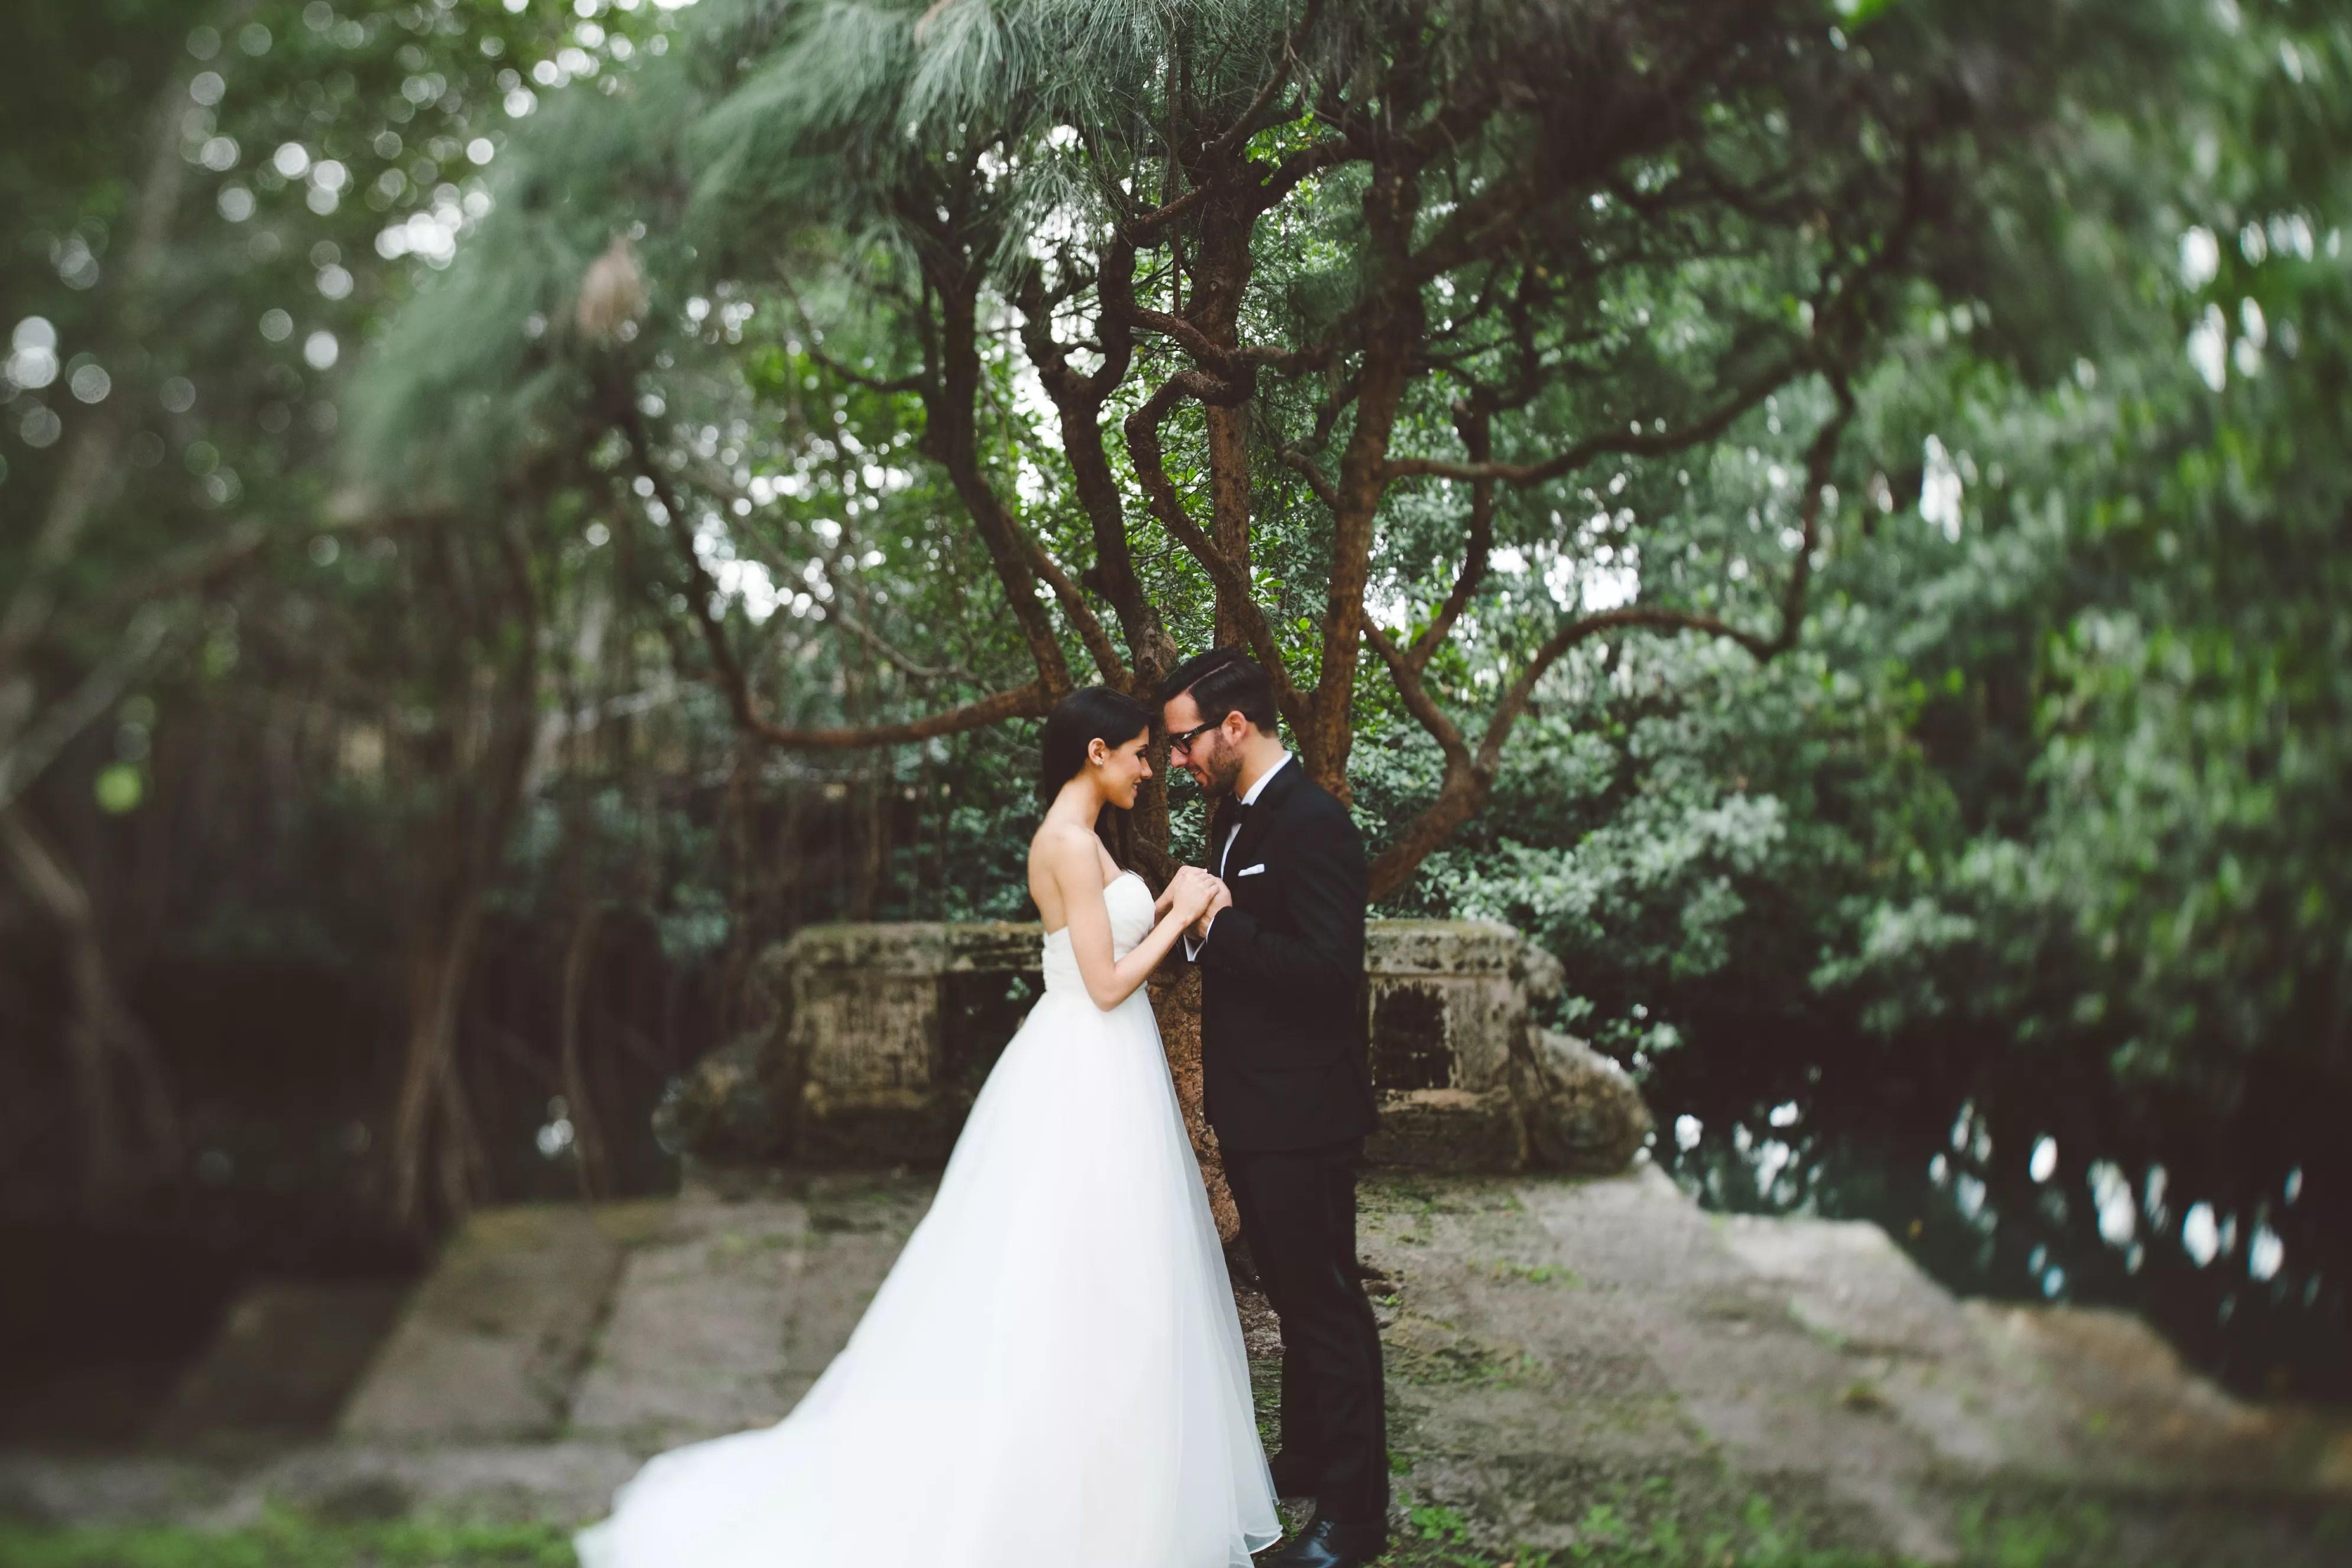 An Elegant Garden Wedding at the Womens Club of Coconut